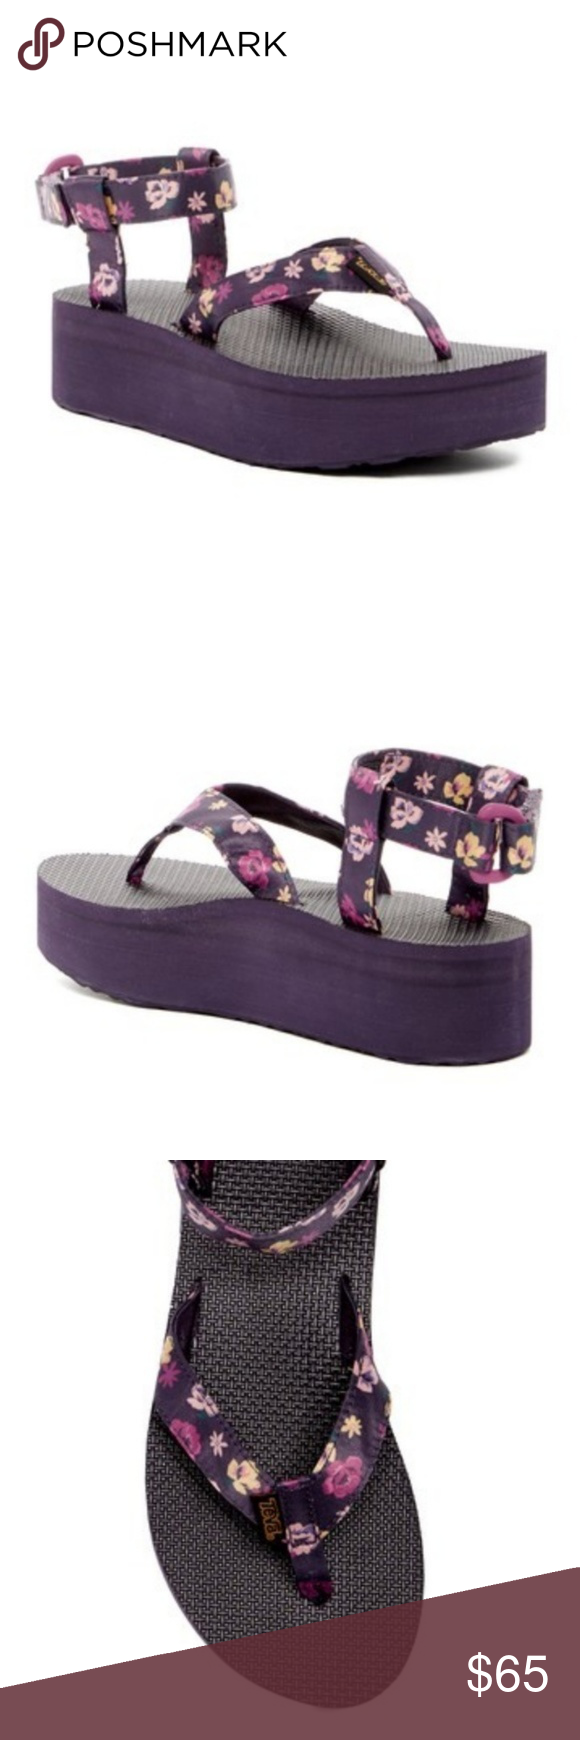 39236e89e35e NWT Teva Purple Floral Flatform Thong Sandal NWT Teva Purple Floral  Flatform Thong Sandal How perfect